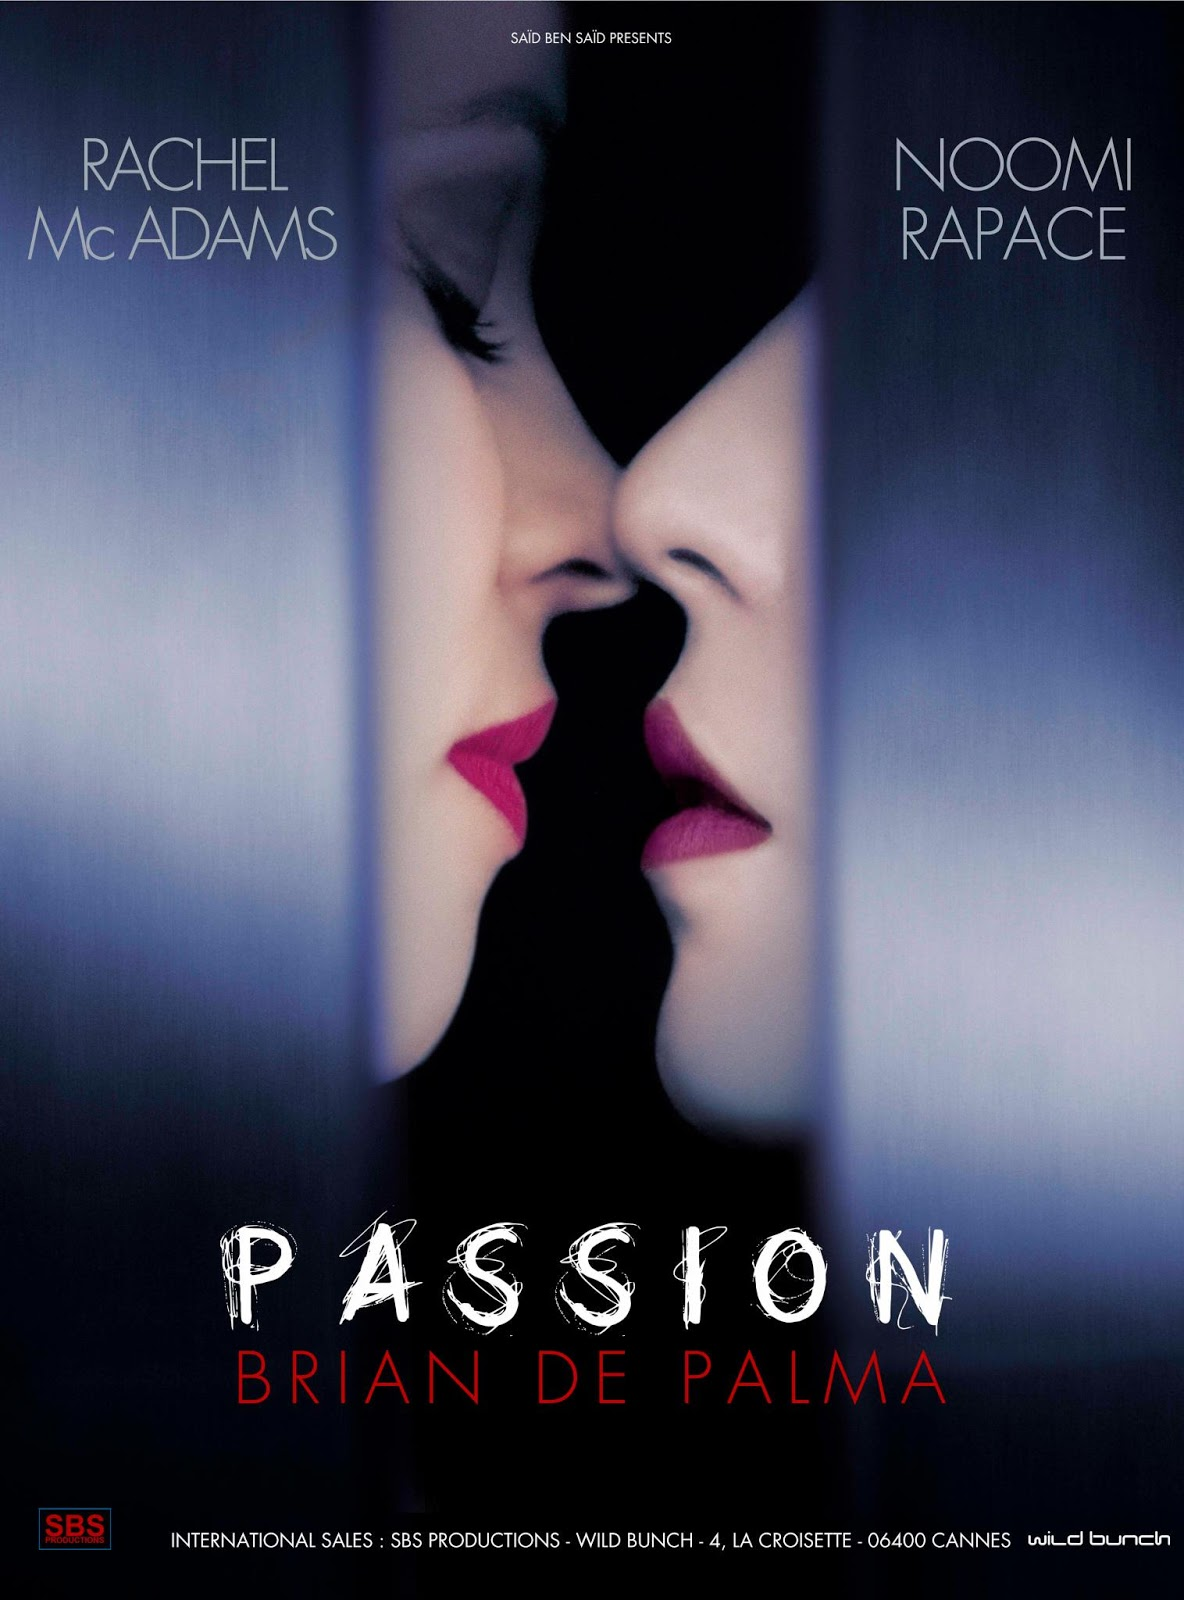 http://4.bp.blogspot.com/-FZUoVlYleP0/UKpEYwy0u6I/AAAAAAAAEFk/wcuBzcVloIw/s1600/Passion-Poster.jpg